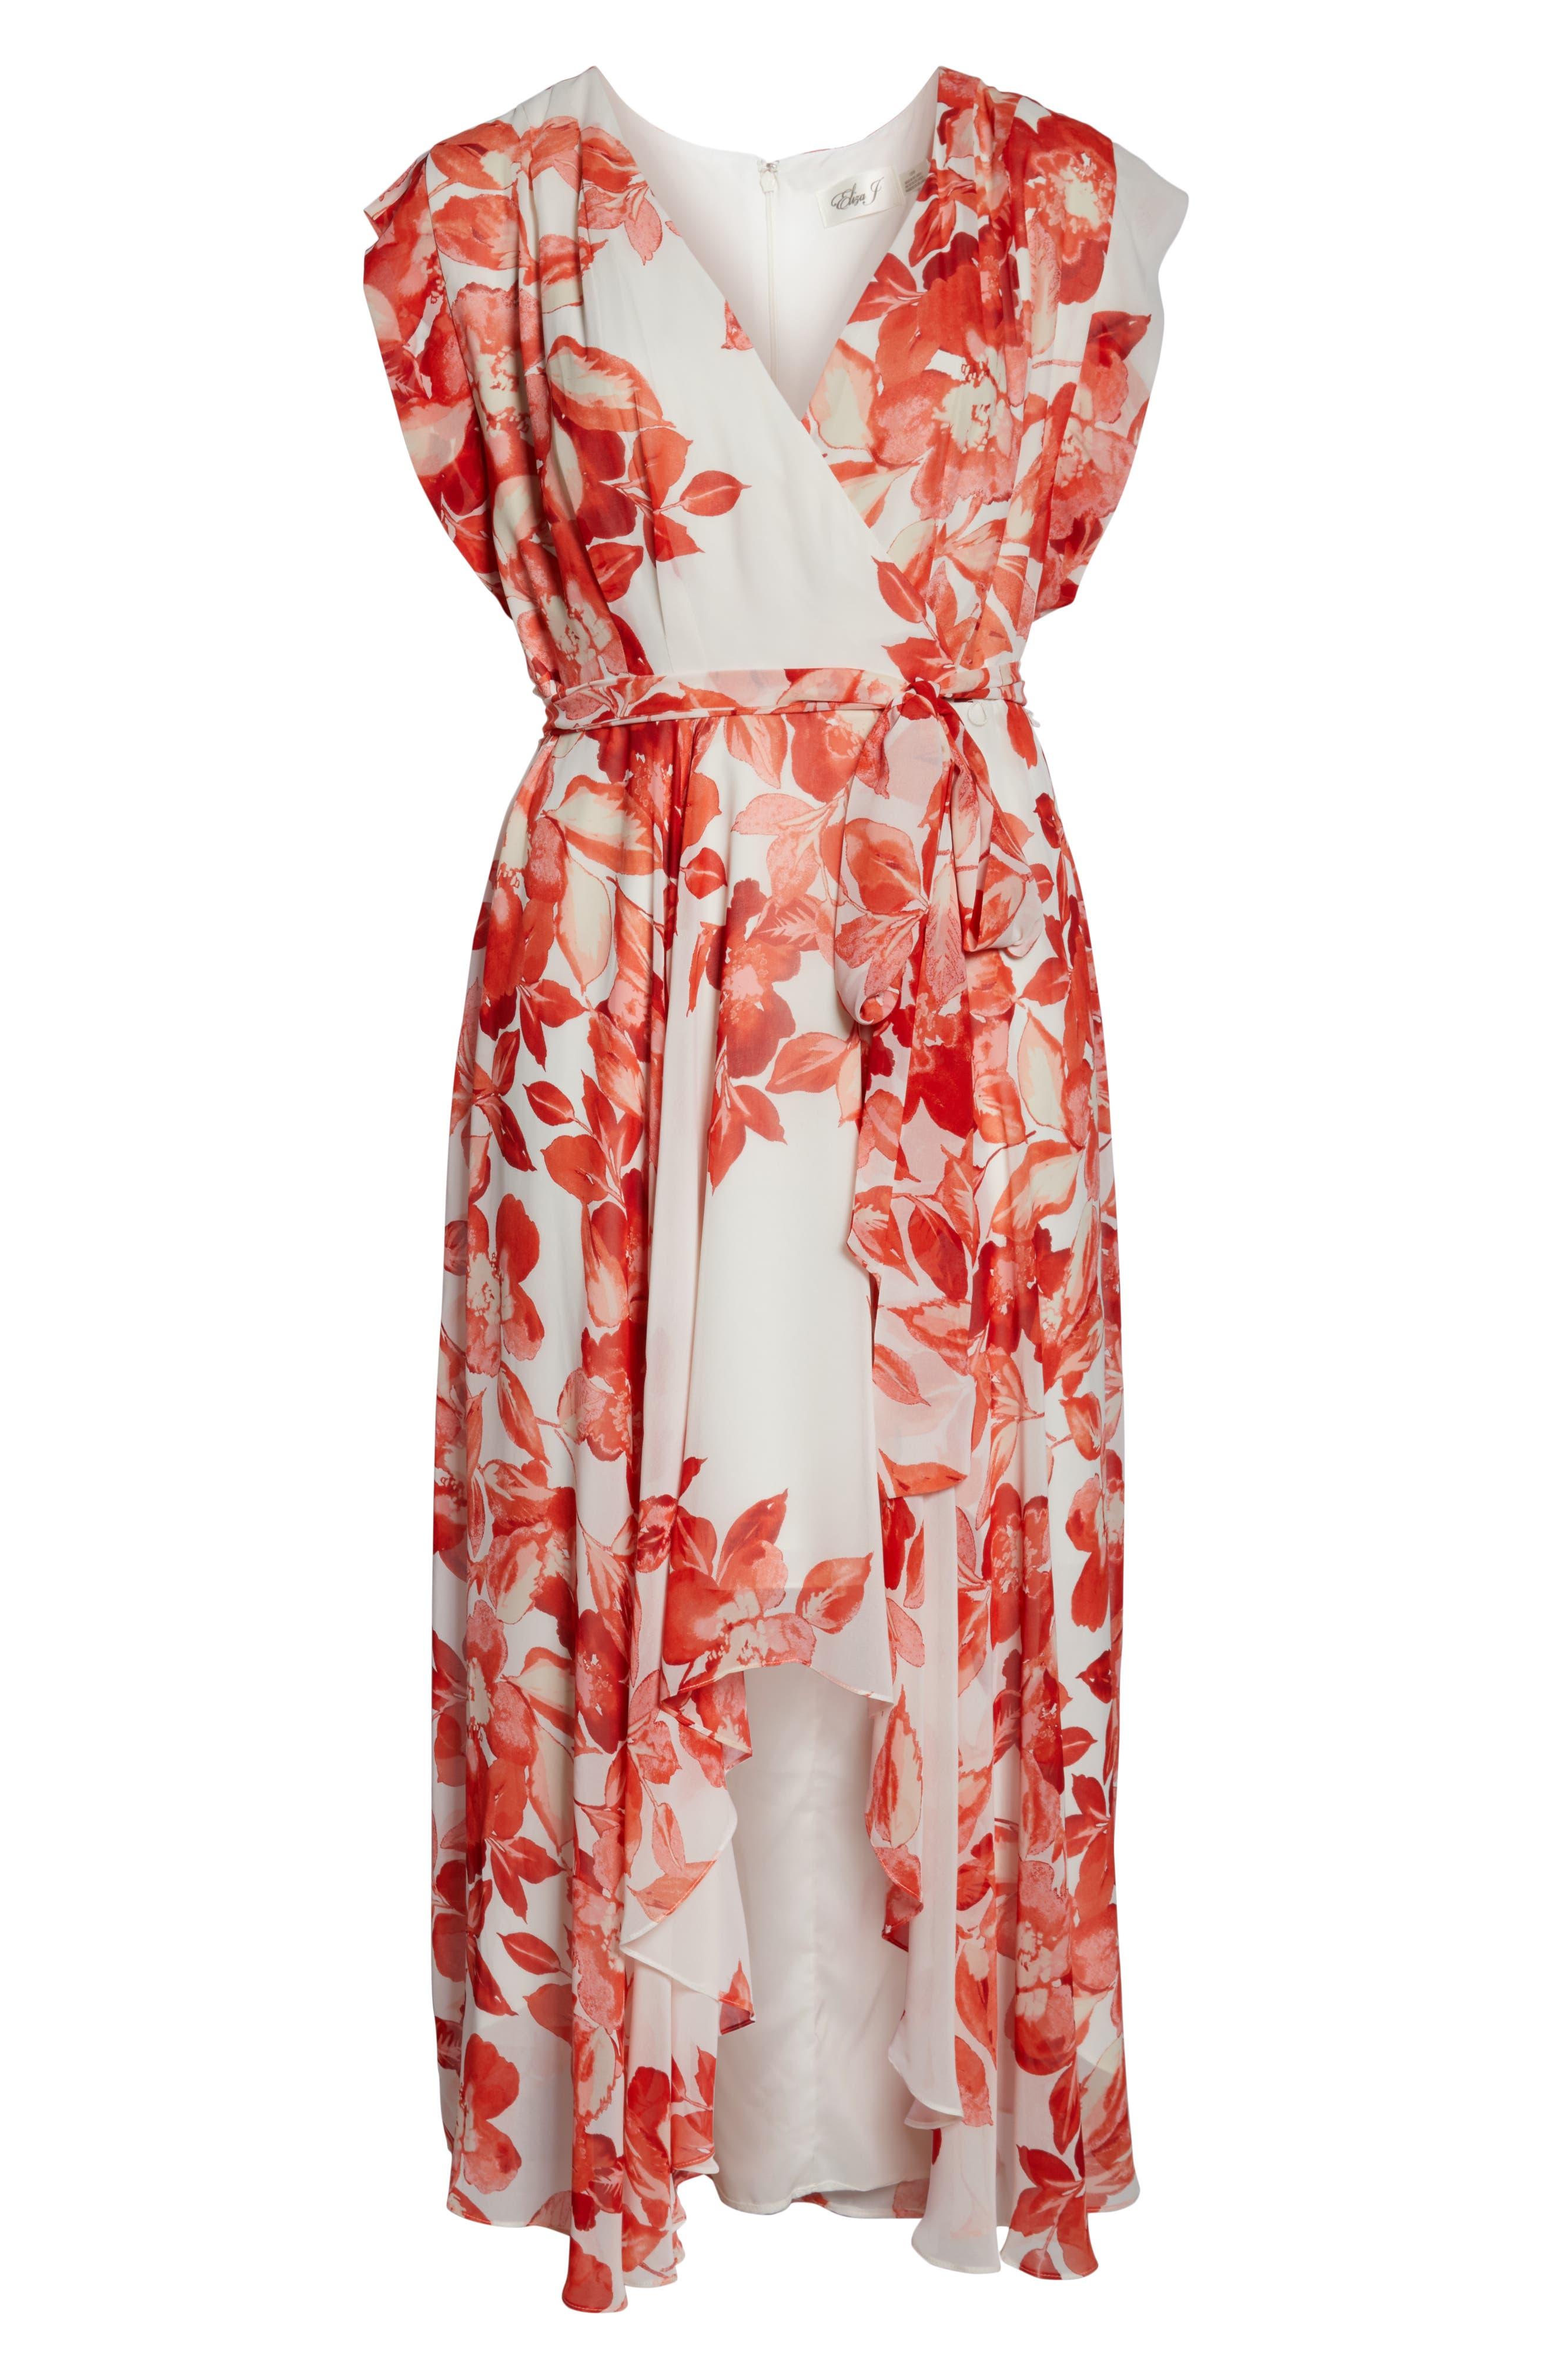 ELIZA J, Floral Chiffon High/Low Maxi Dress, Alternate thumbnail 7, color, 958